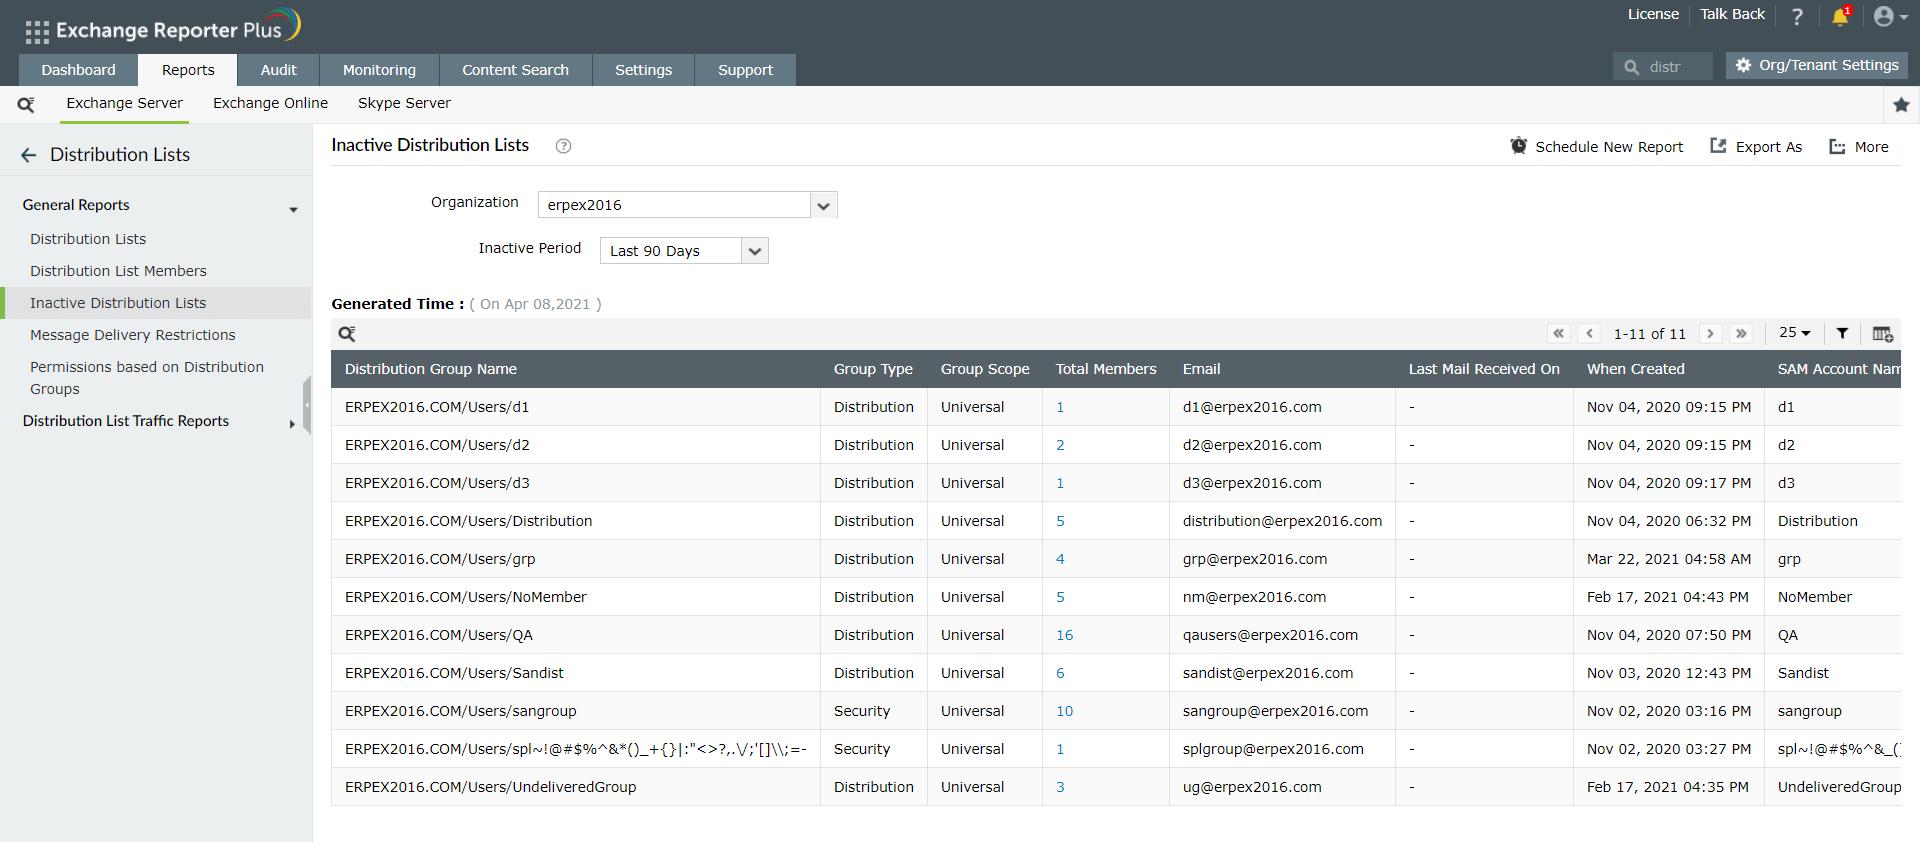 Inactive Distribution Lists report in Exchange Reporter Plus